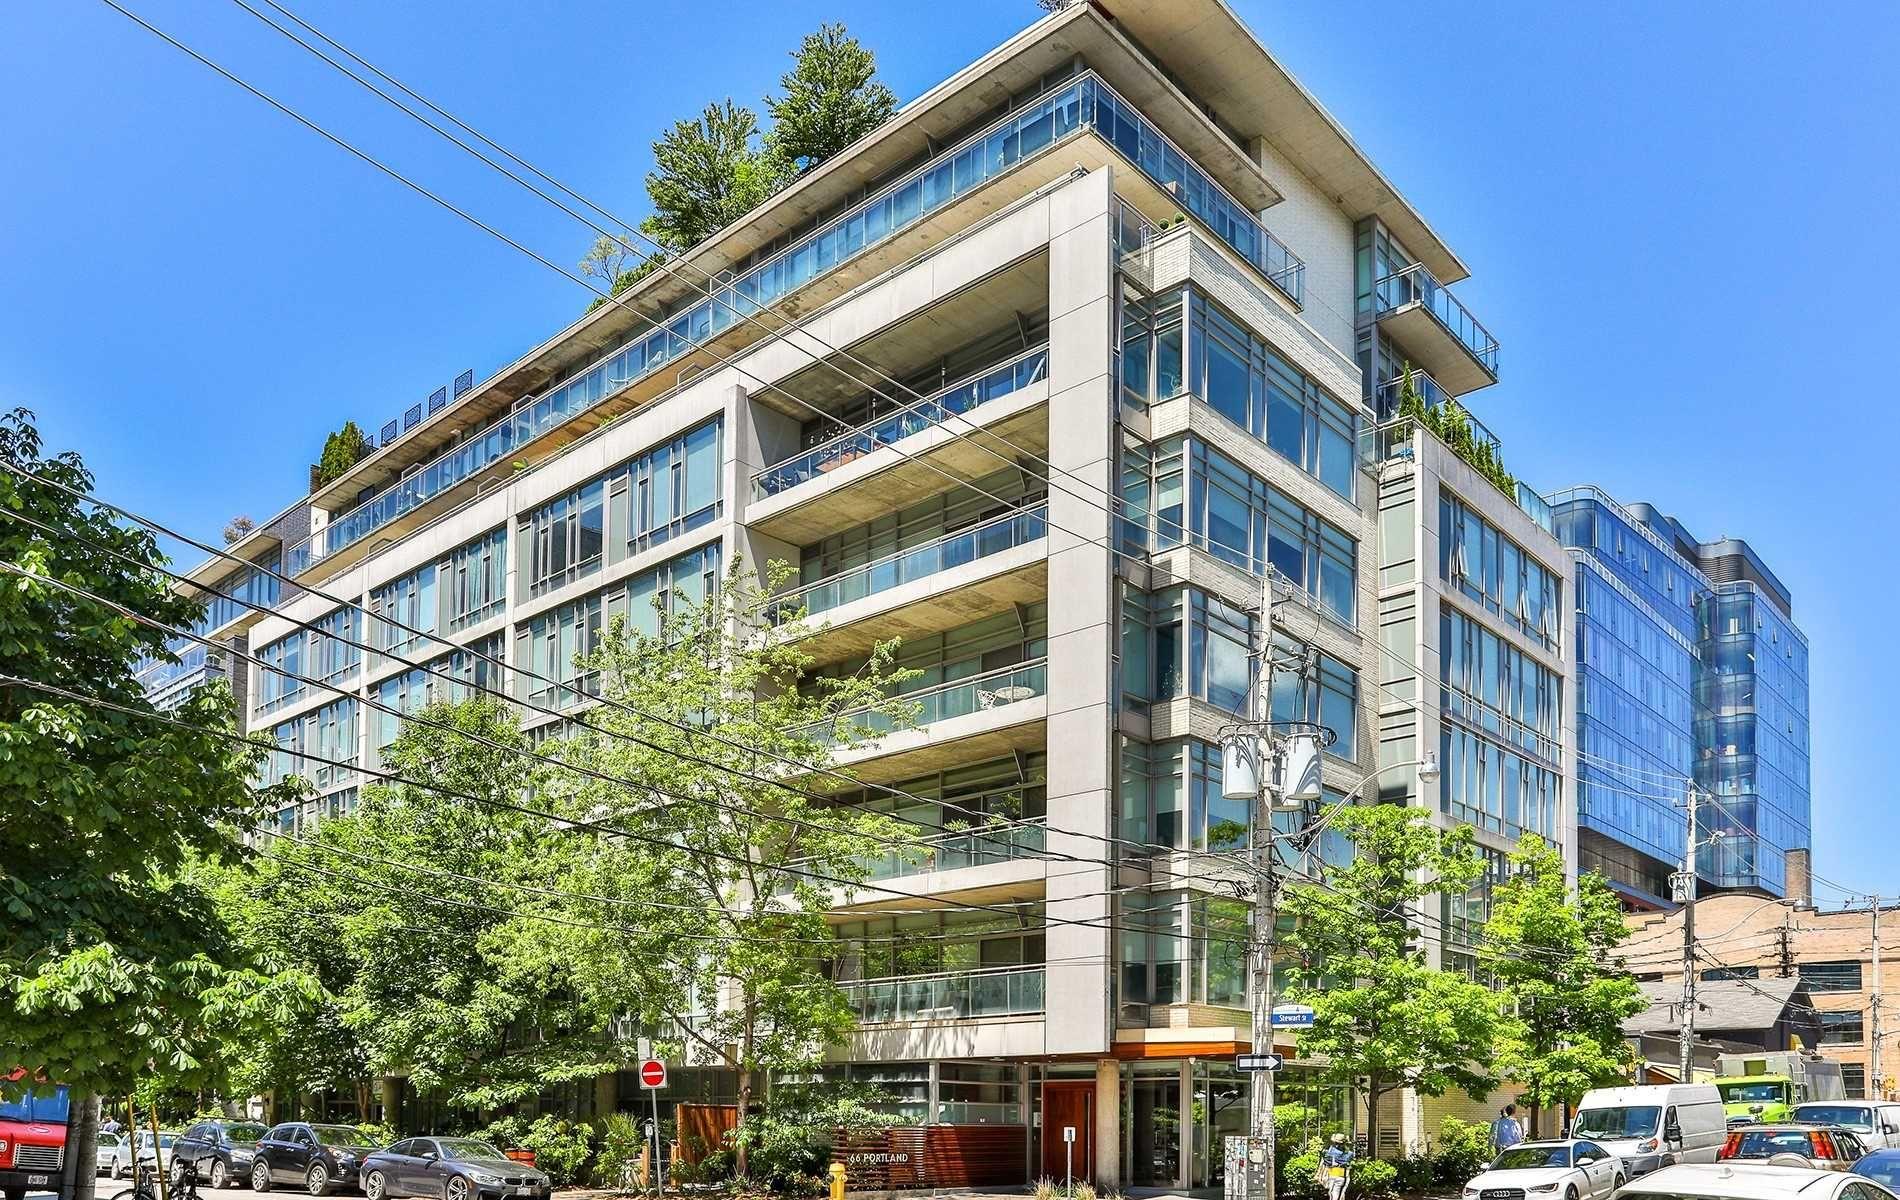 Main Photo: 702 66 Portland Street in Toronto: Waterfront Communities C1 Condo for sale (Toronto C01)  : MLS®# C4489427